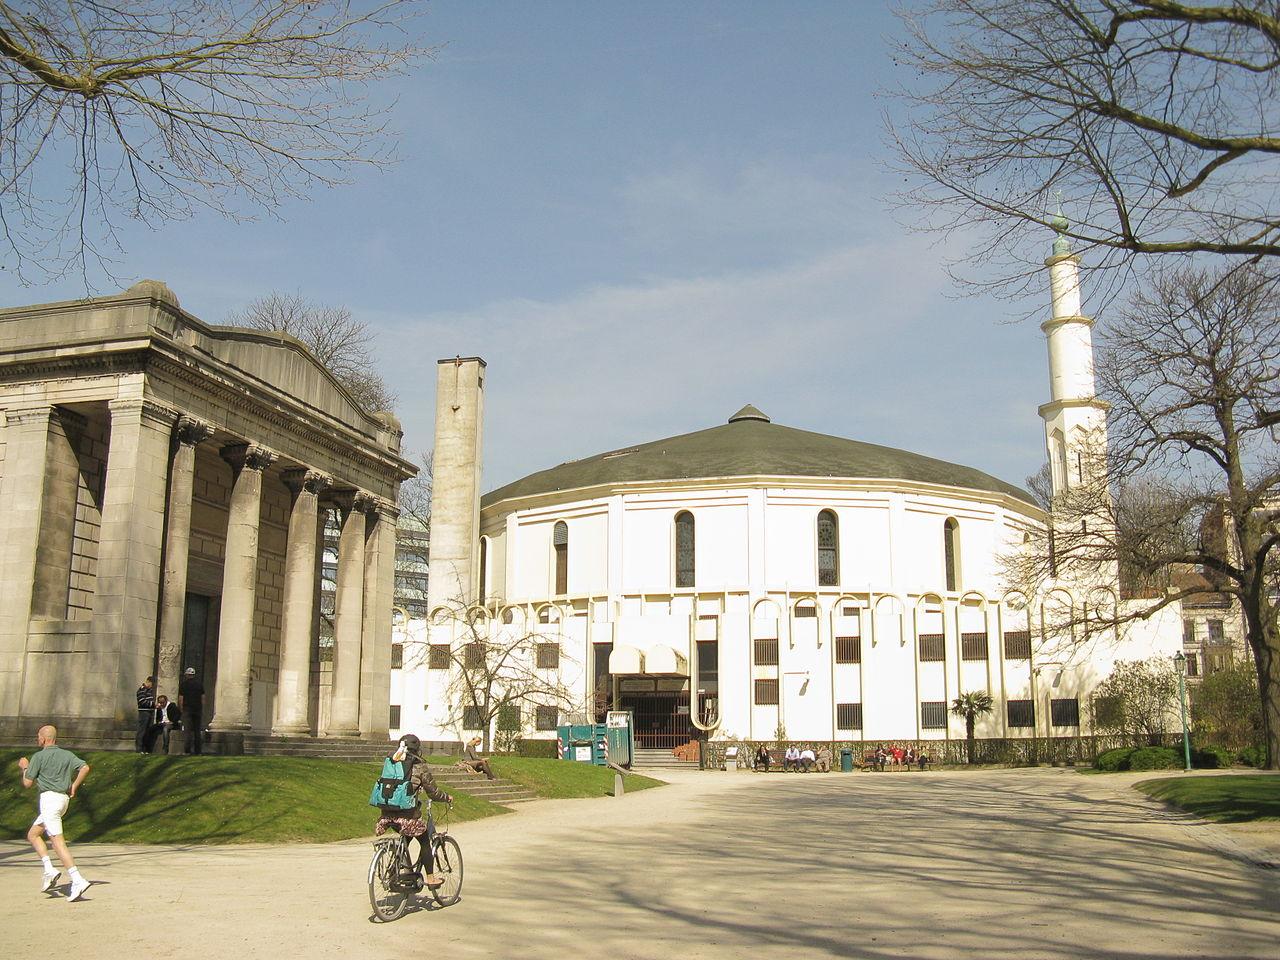 Masjid Agung Brussels